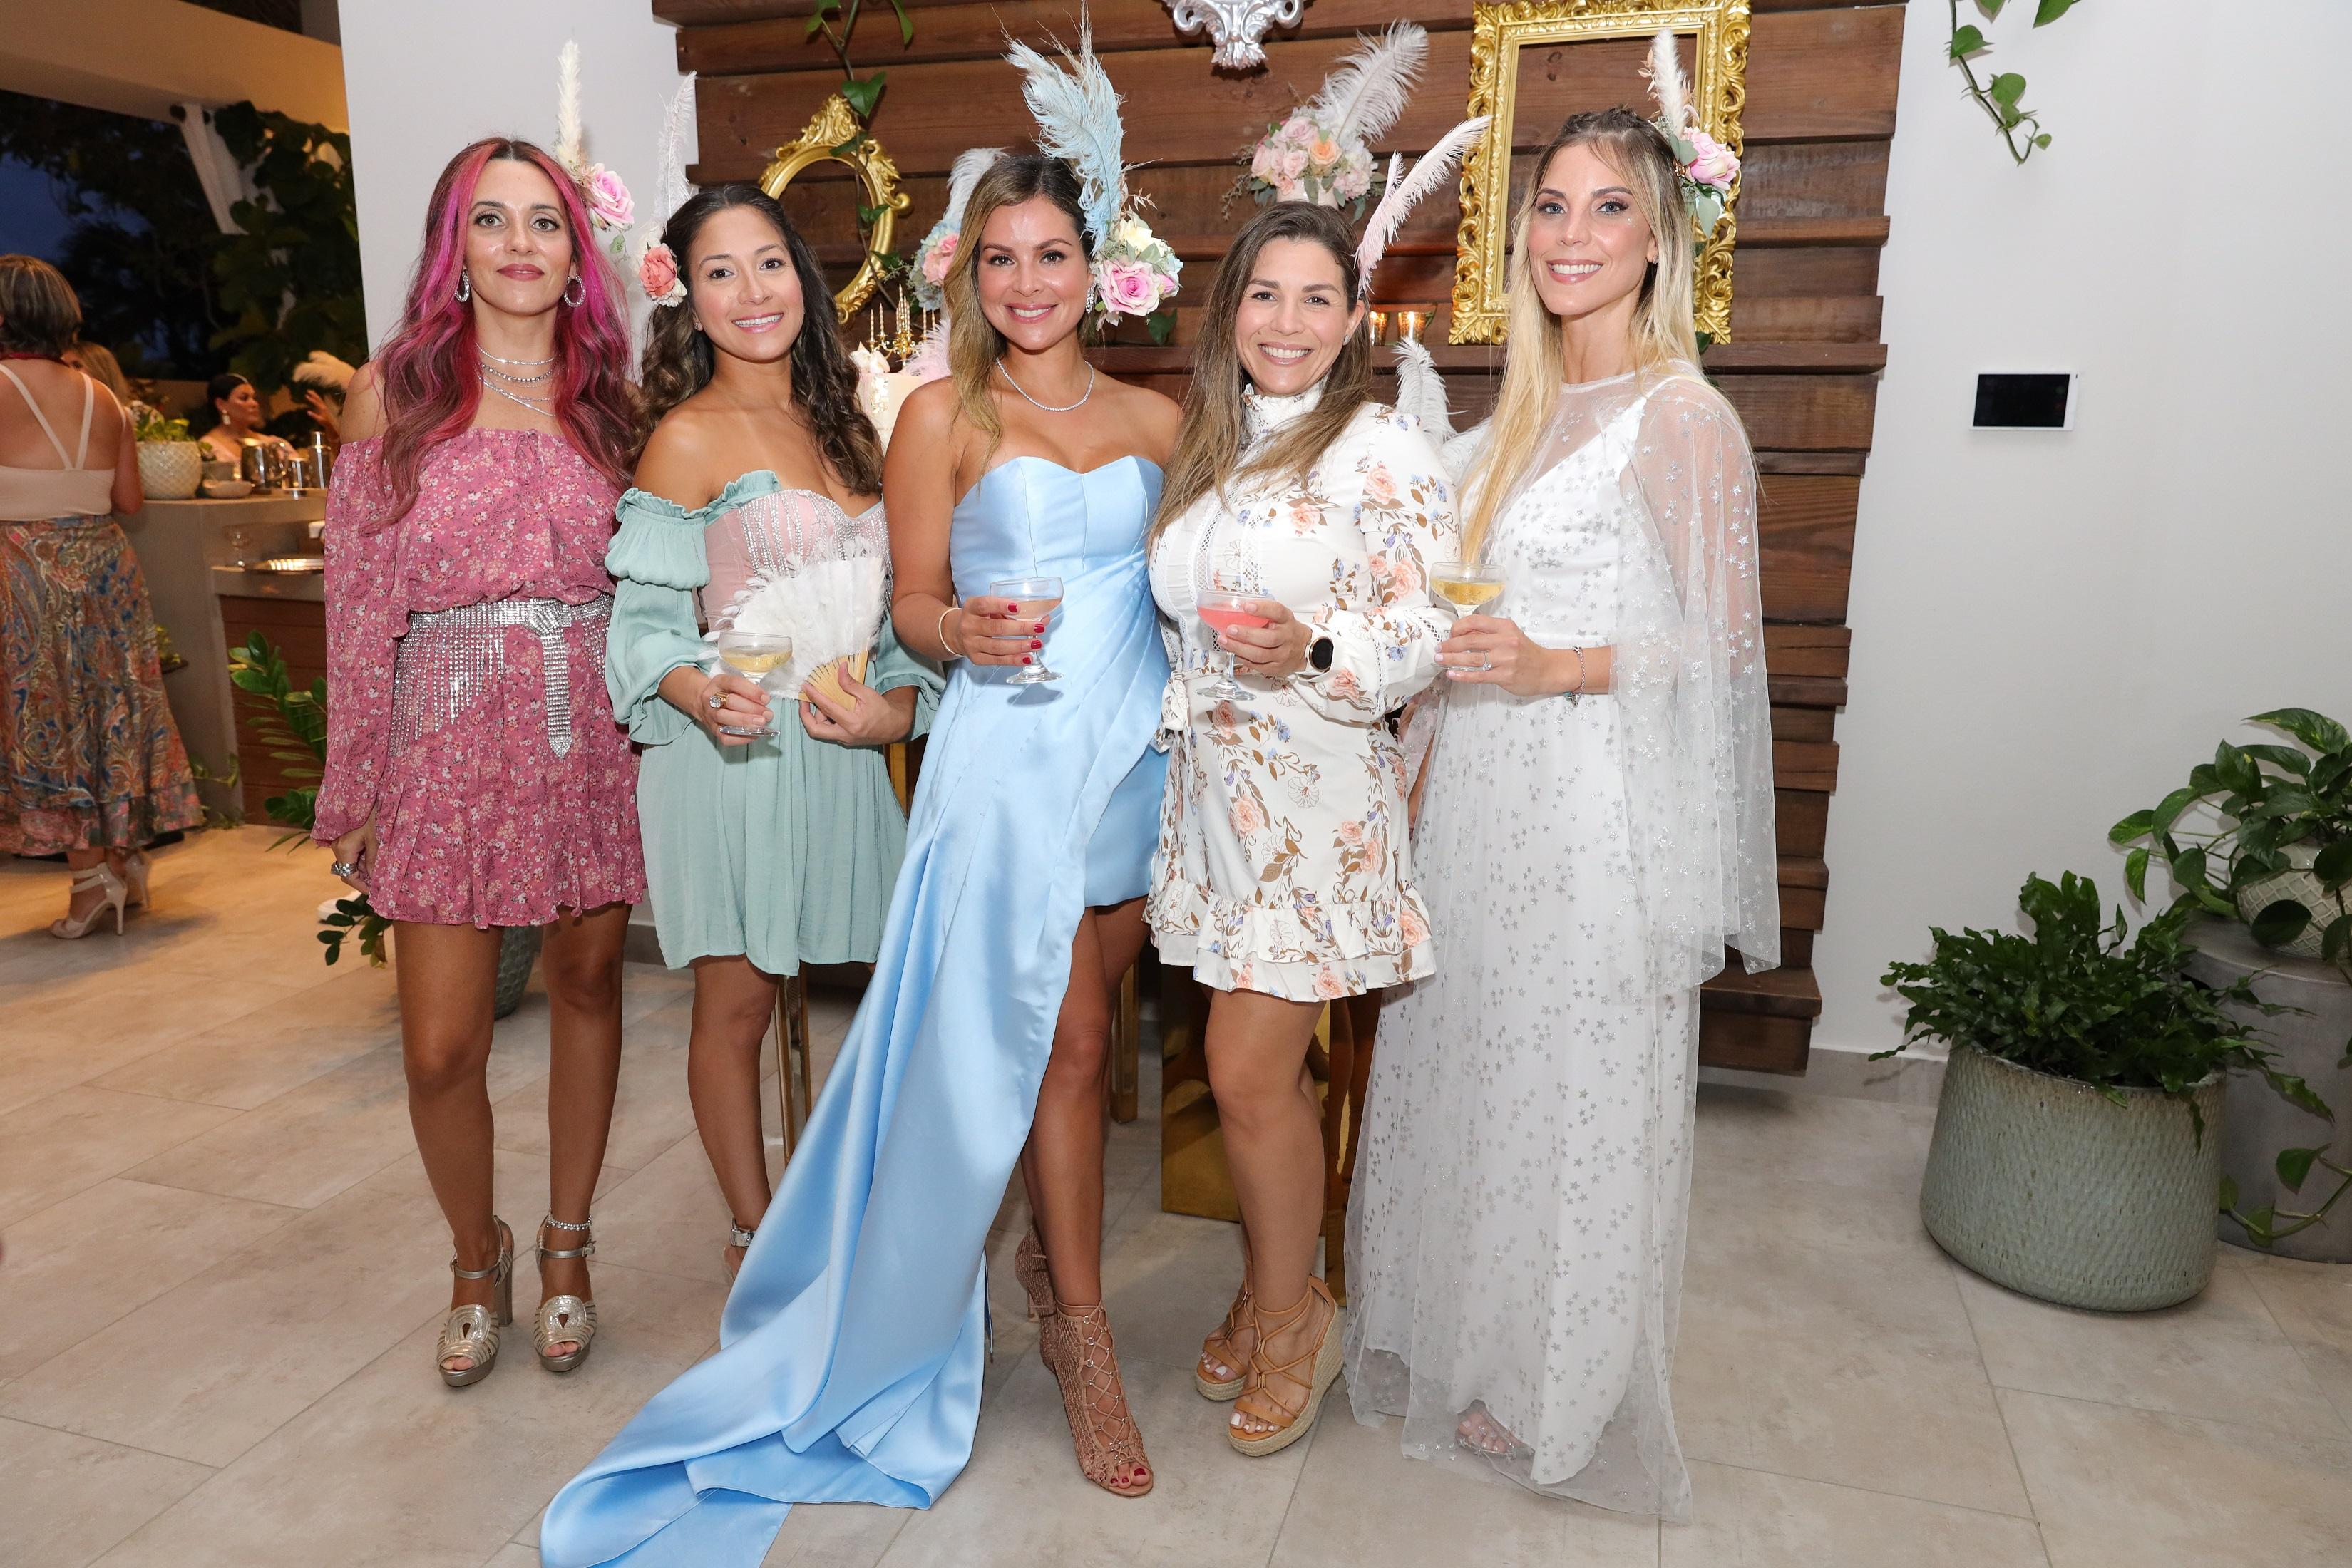 Gloria Joy, Vanessa Corchado, Mónica Ponce, Sharon Ponce y Mónica Paraliticci (Suministrada/Karina Margary)